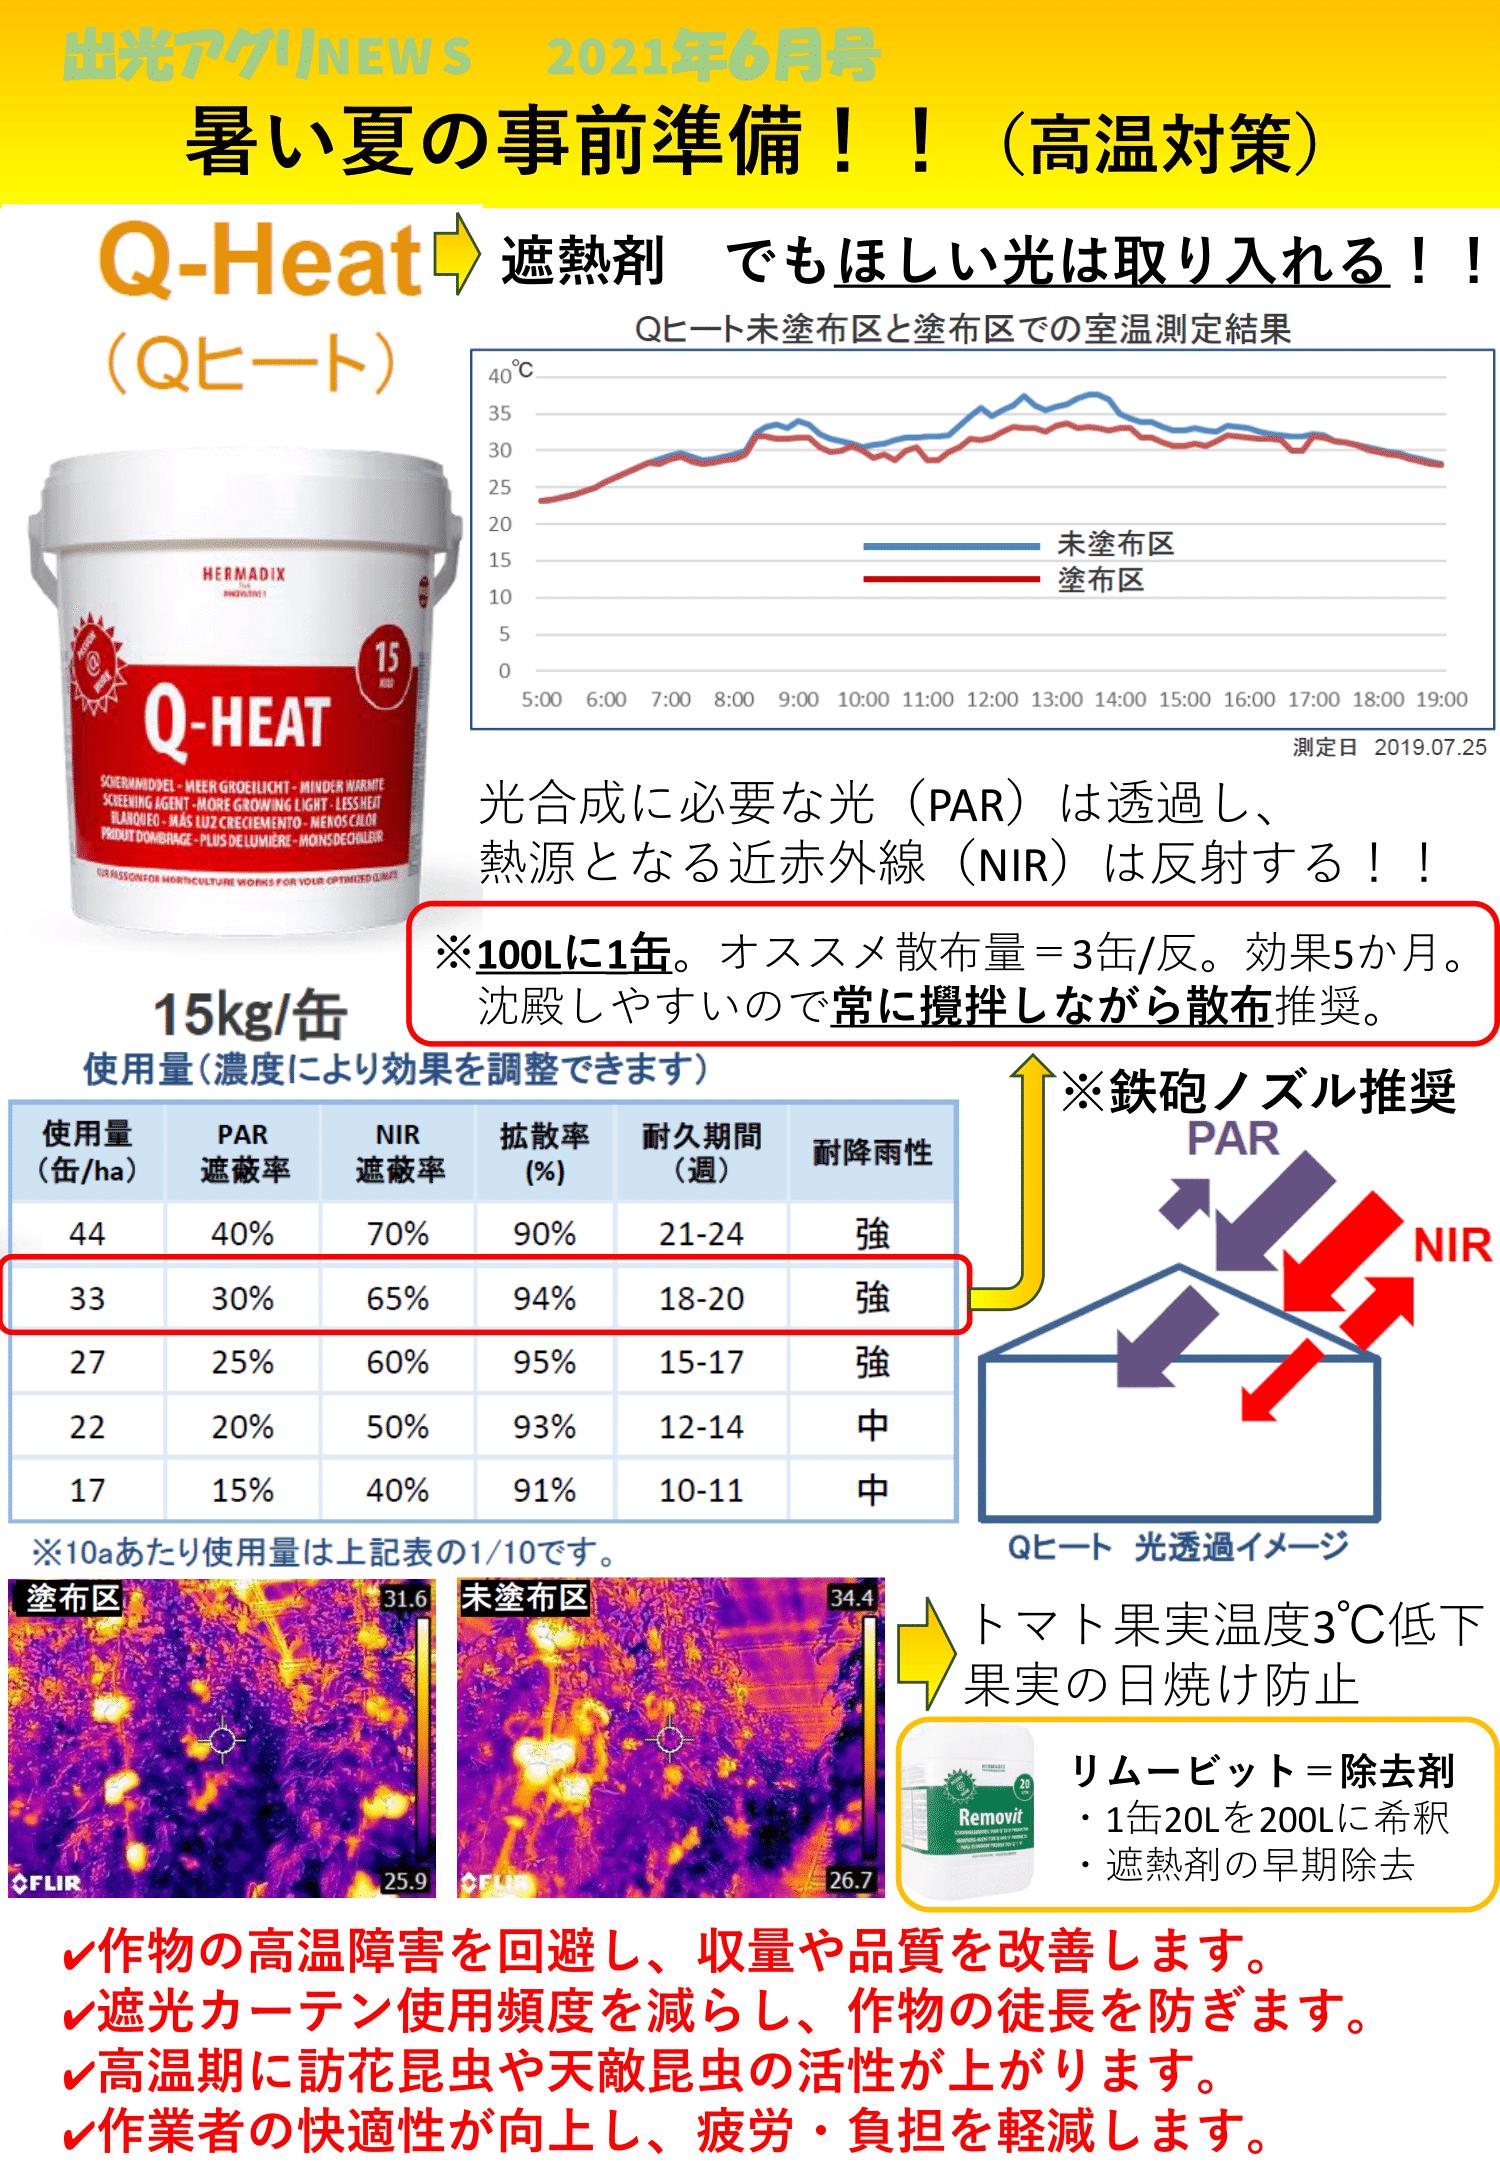 news_2102